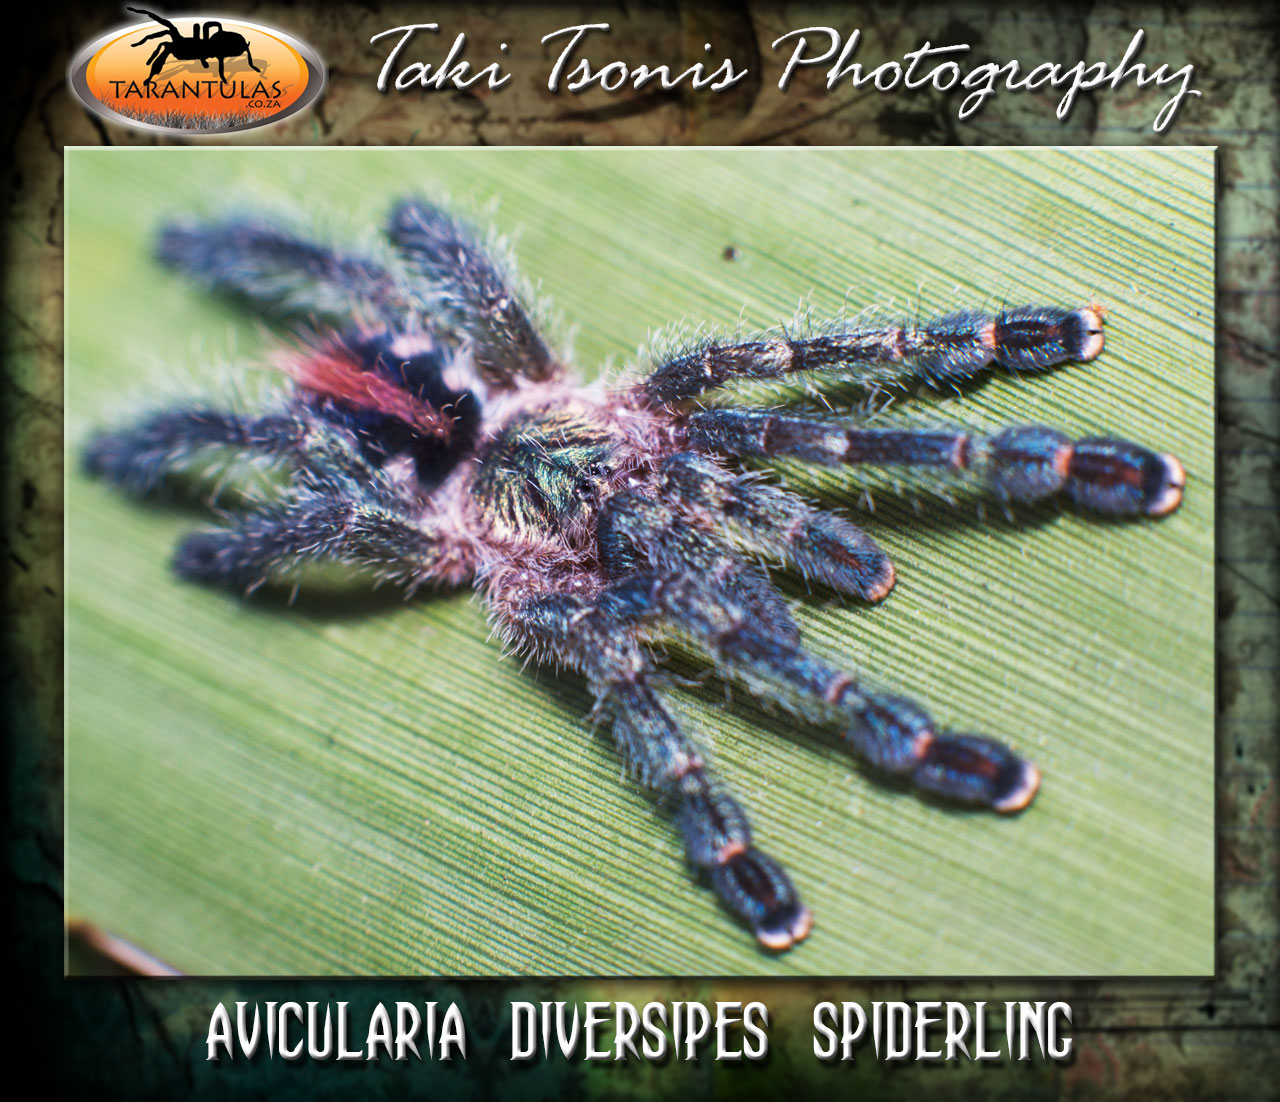 Avicularia diversipes Spiderling